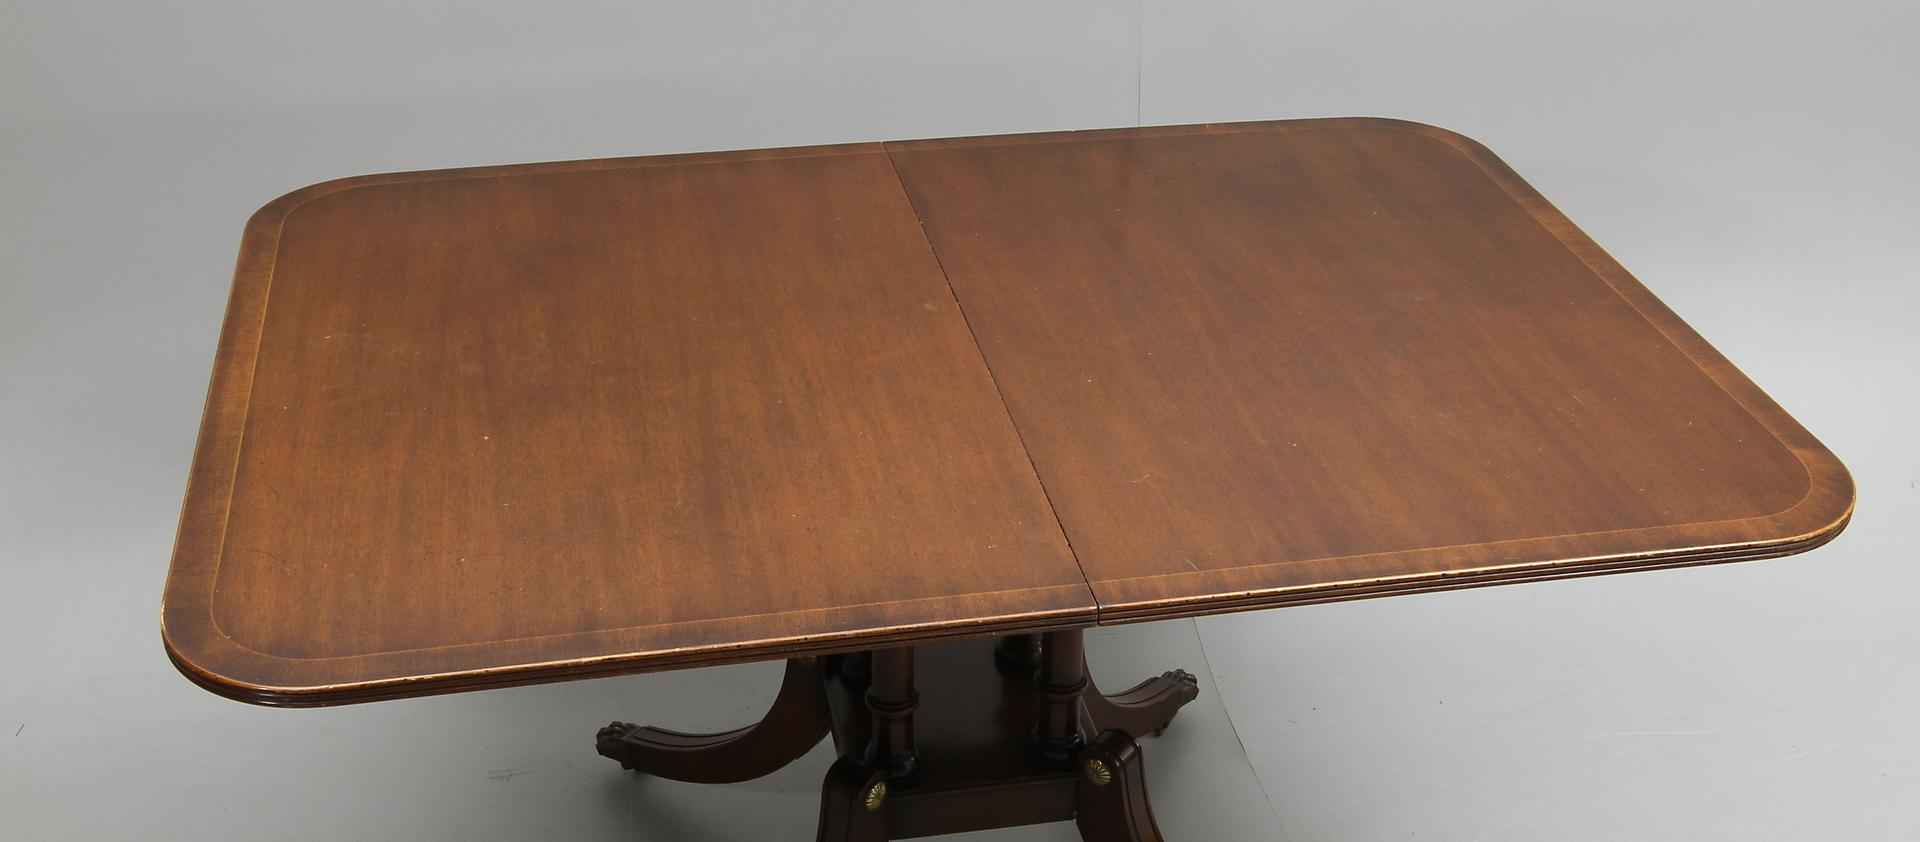 Images for 125710 MATSALSBORD, engelsk stil, 1900 tal Auctionet